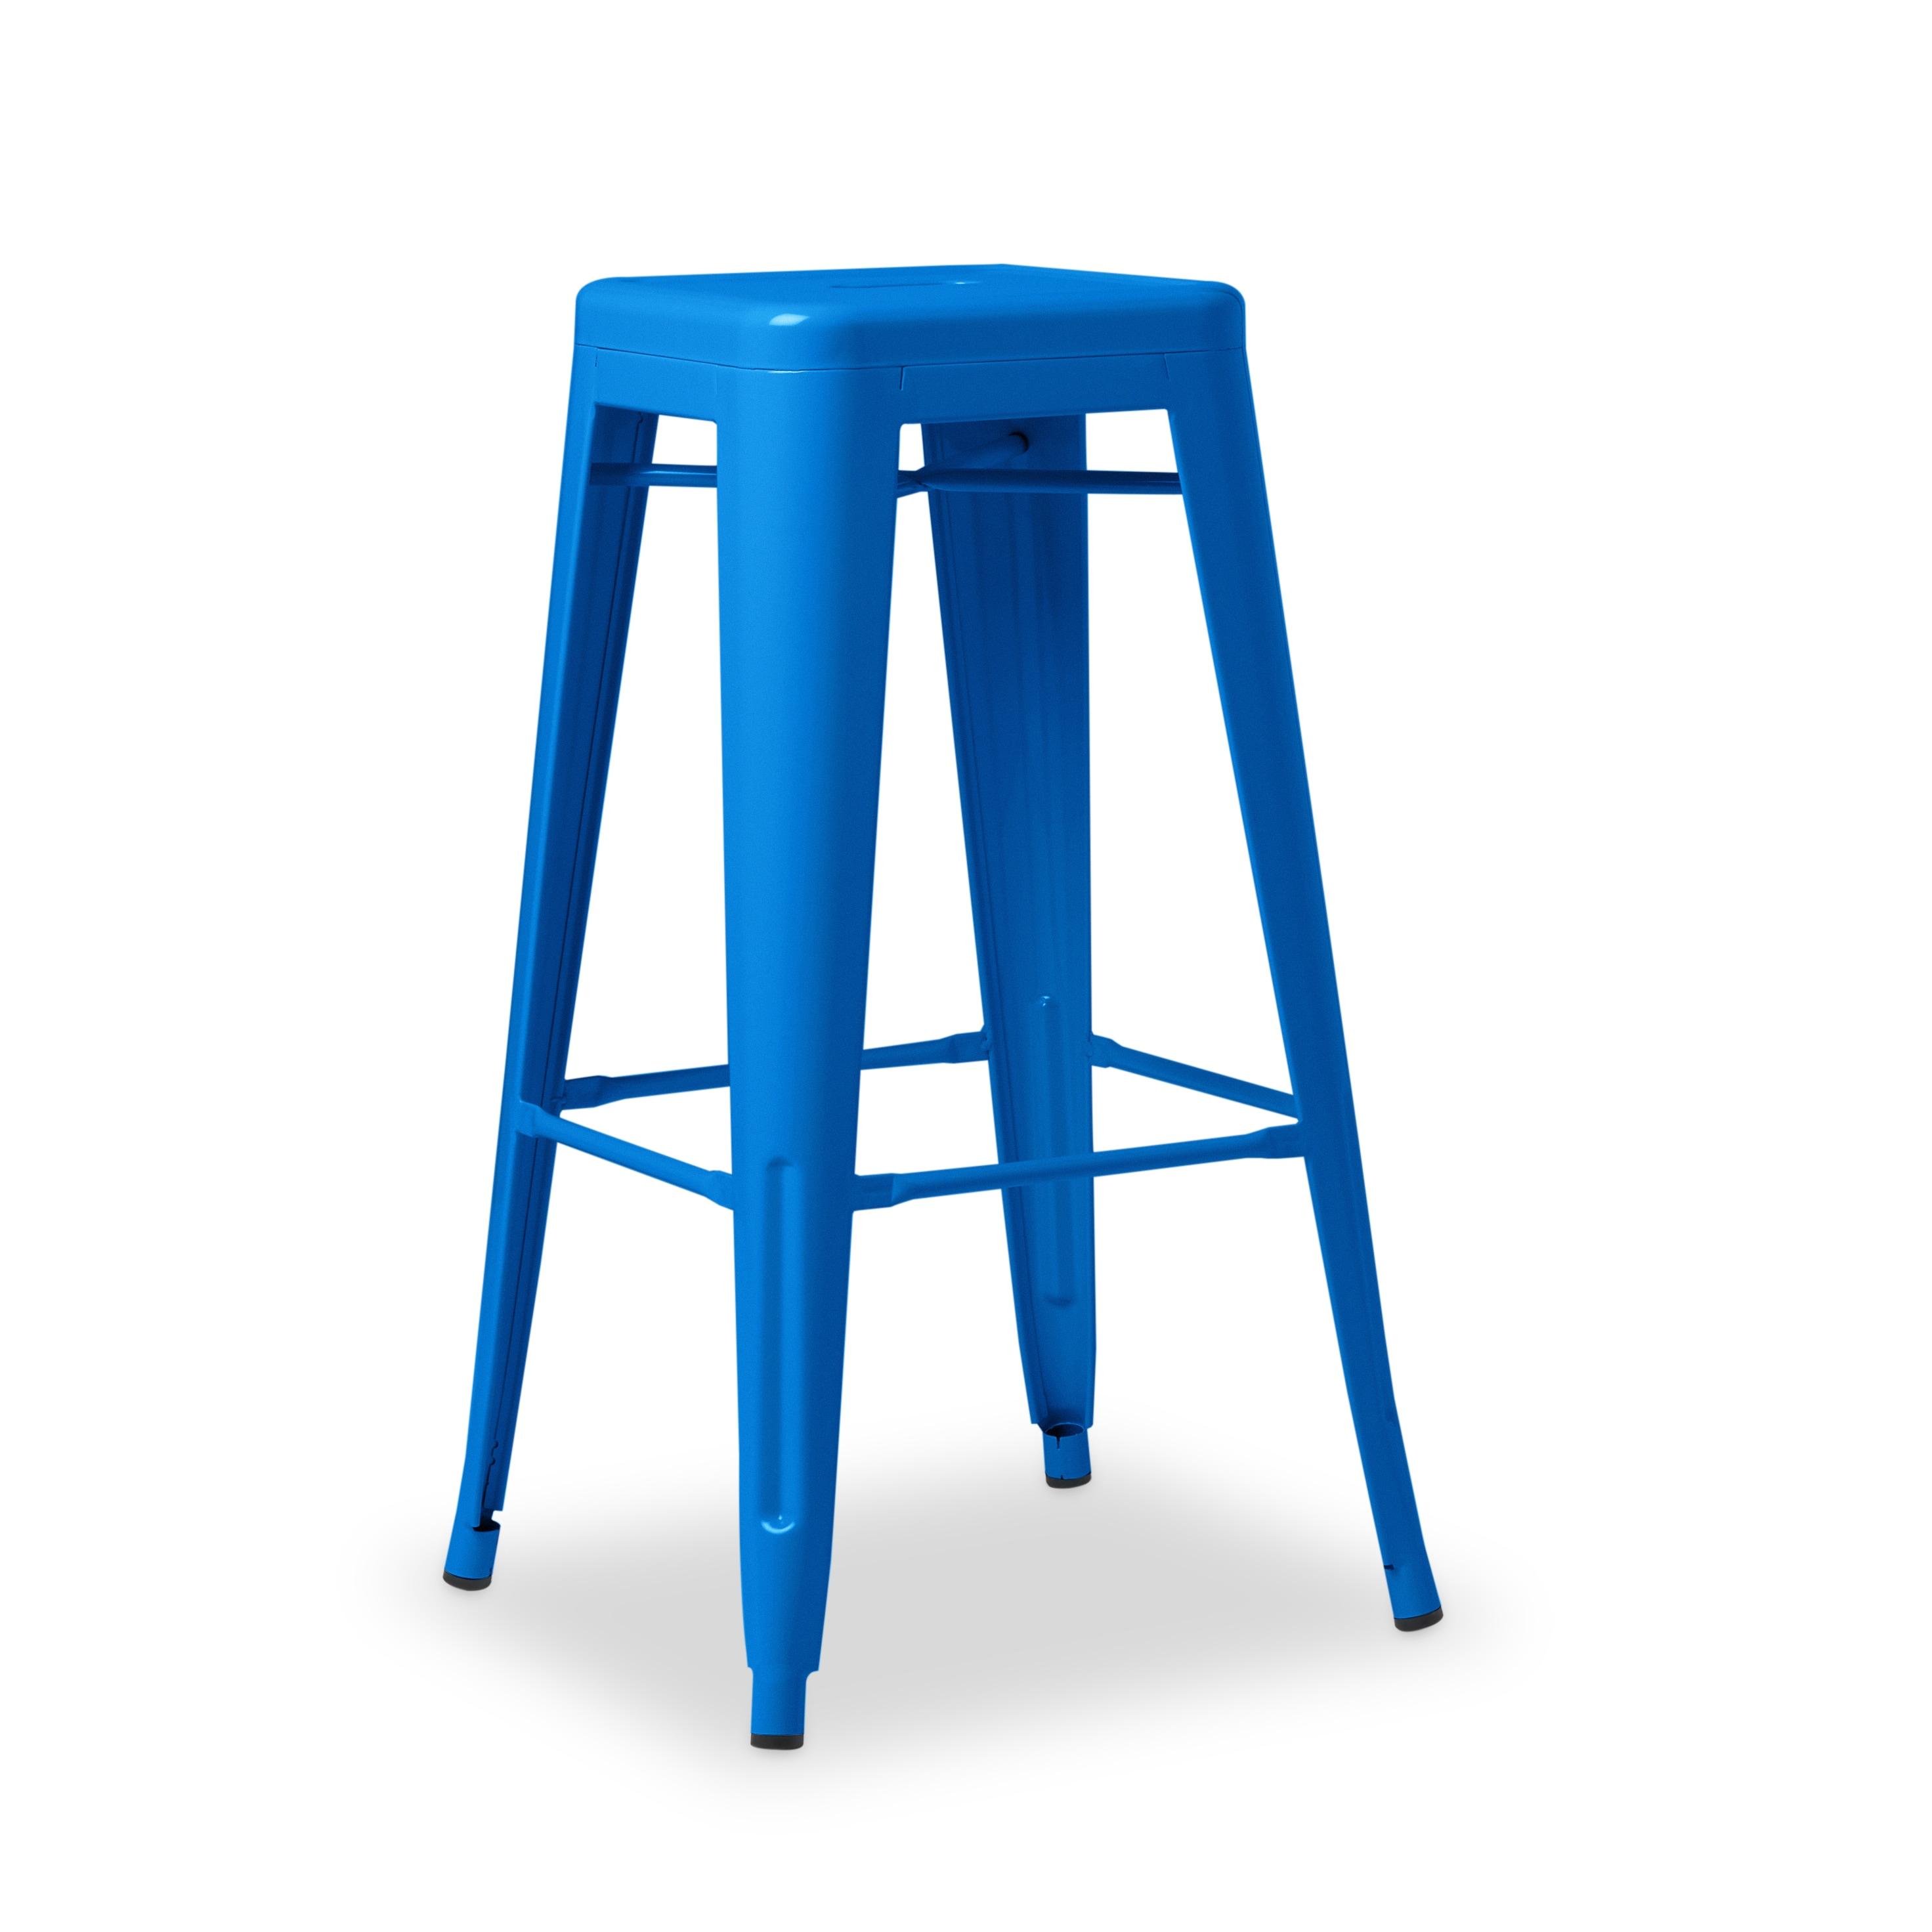 Carbon Loft Tabouret 30 Inch Baja Blue Metal Bar Stools (Set Of 2)   Free  Shipping Today   Overstock.com   14995154